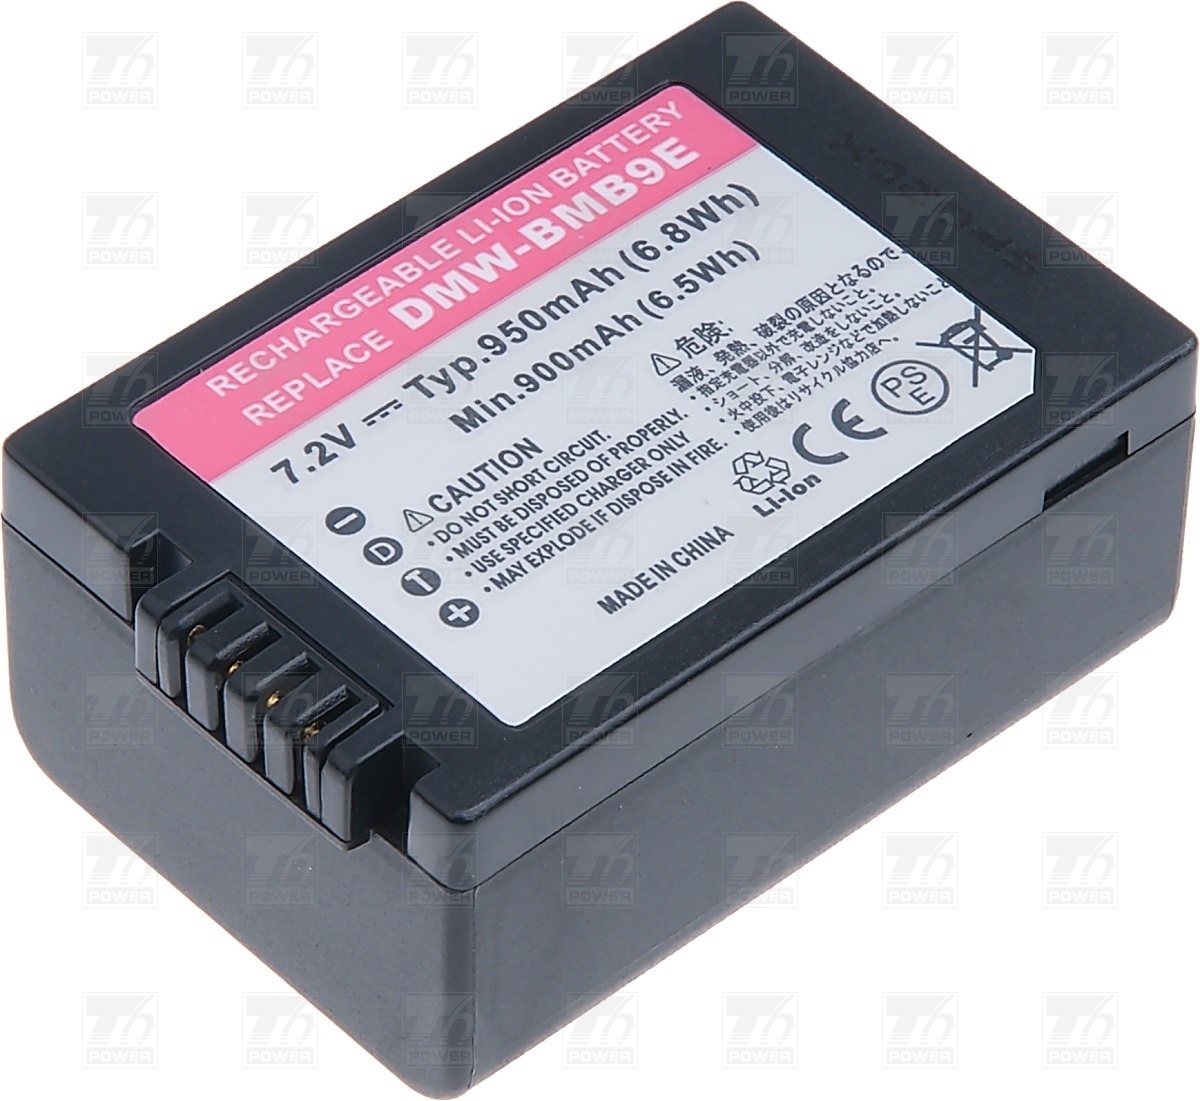 T6 power Baterie T6 power DMW-BMB9E, DMW-BMB9GK, DMW-BMB9 DCPA00